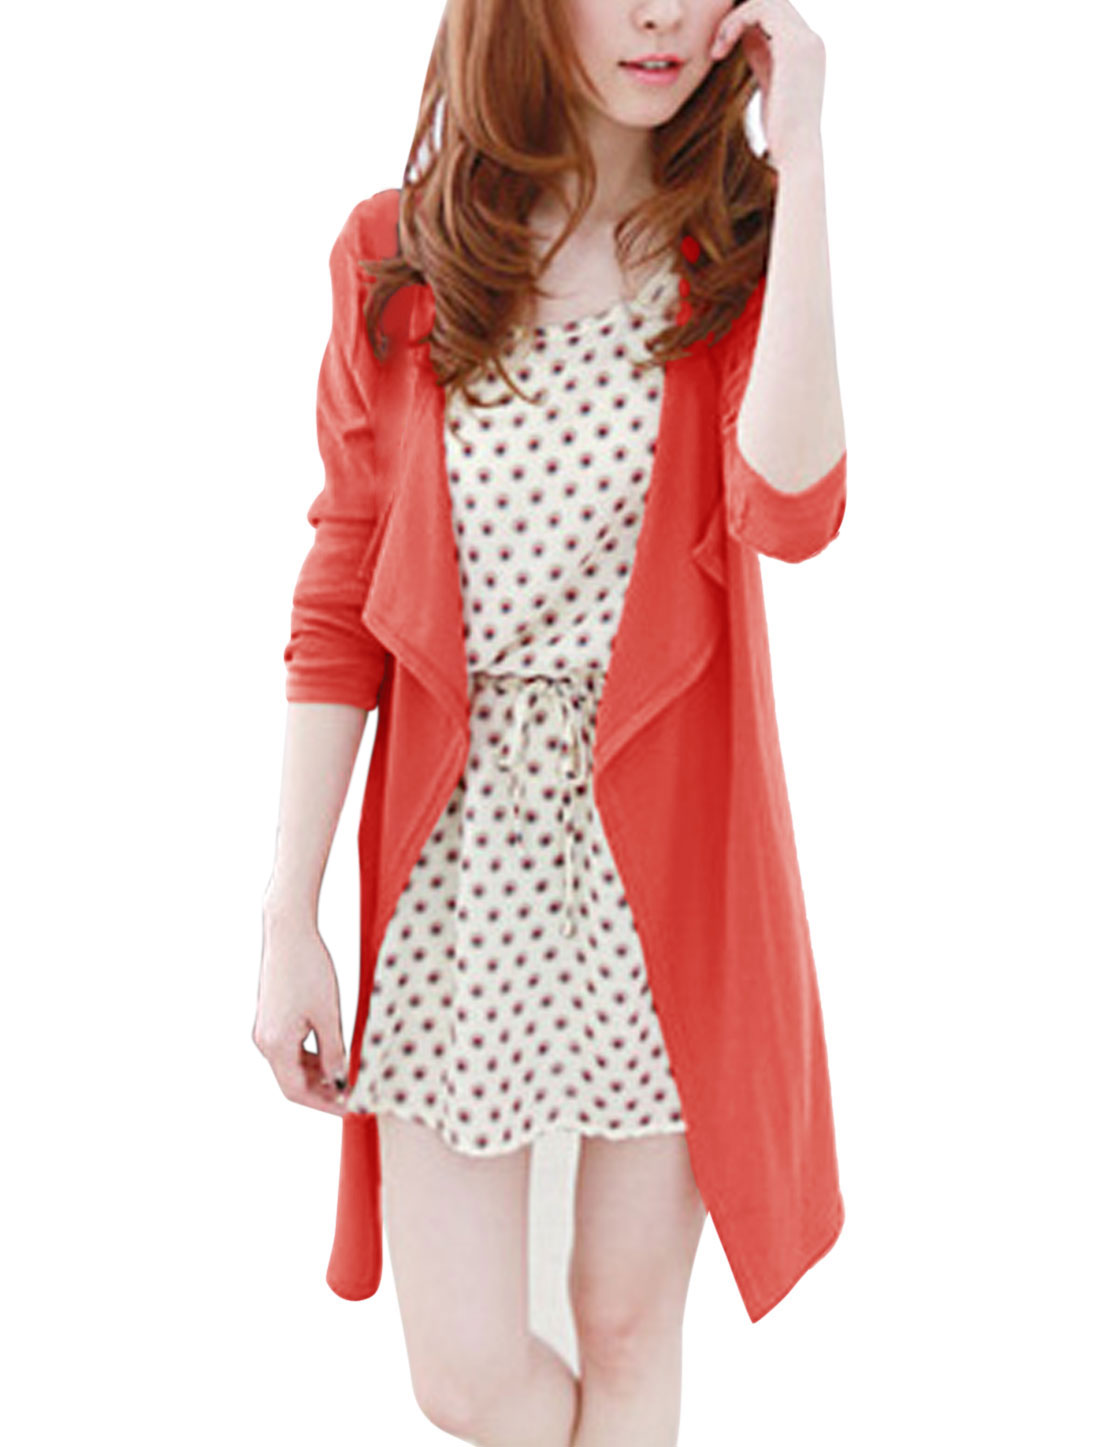 Lady Draped Buttonless Long Sleeve Leisure Cardigan Watermalon Red XS